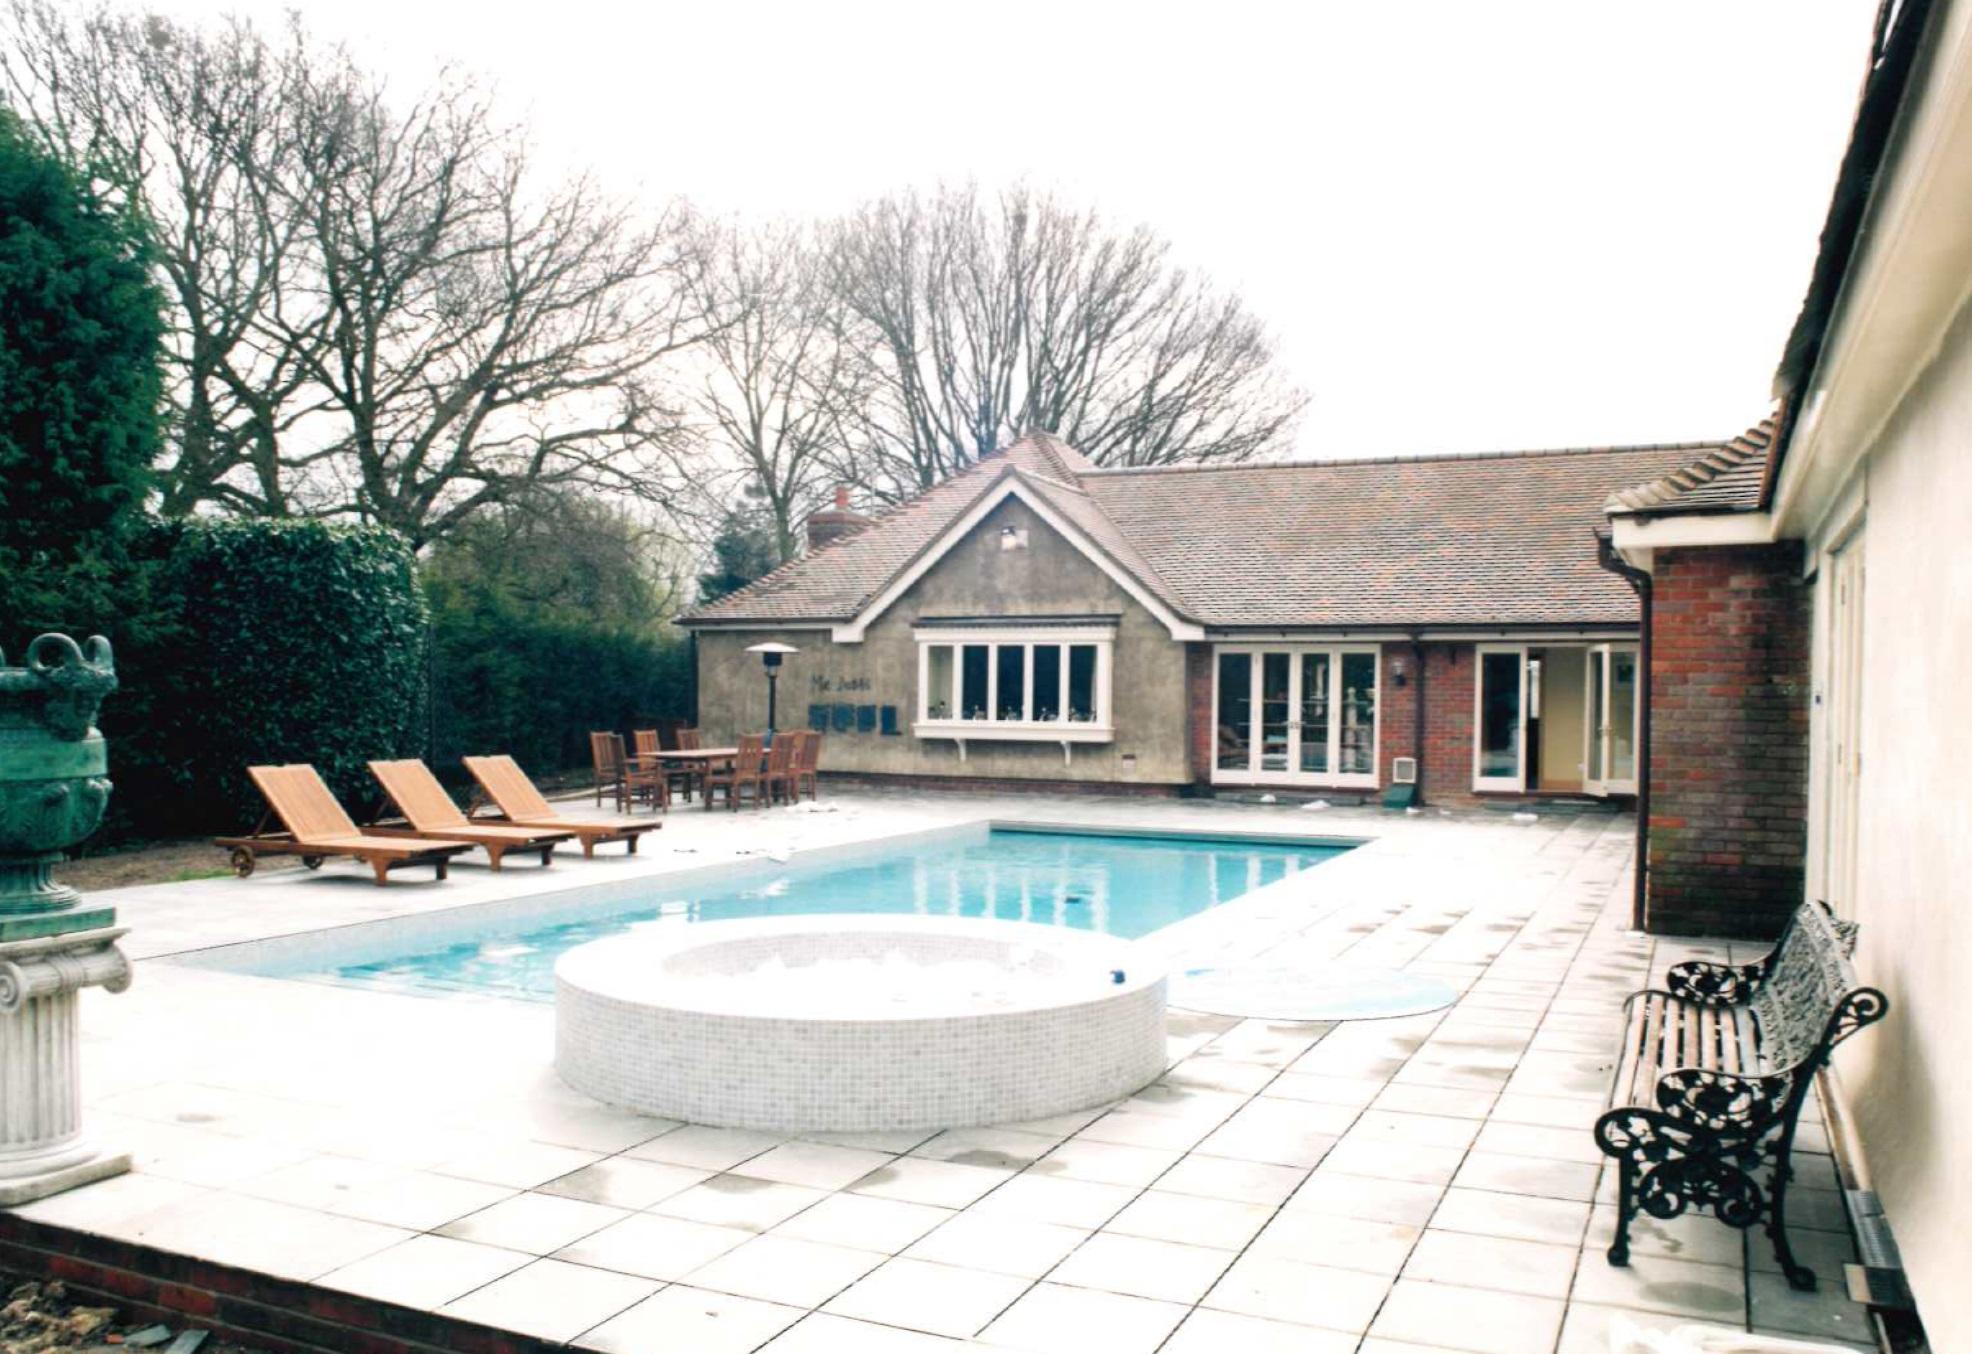 Michael Barrymore's pool